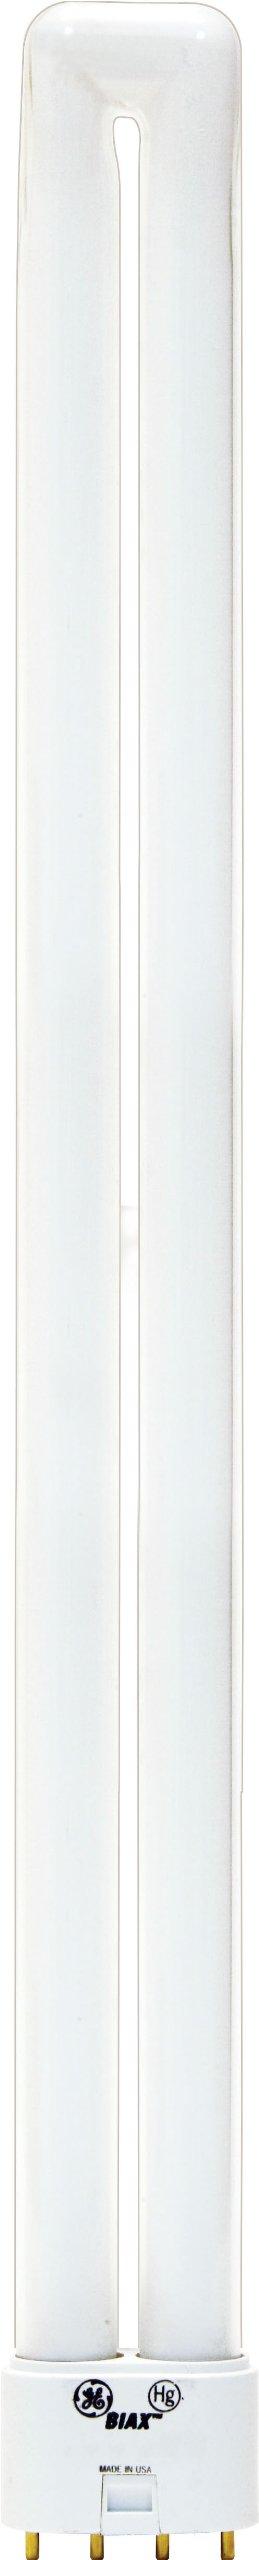 GE Lighting Energy Smart CFL 17175 18-Watt, 1250-Lumen Biax Light Bulb with 4-Pin (2G11) Base, 10-Pack